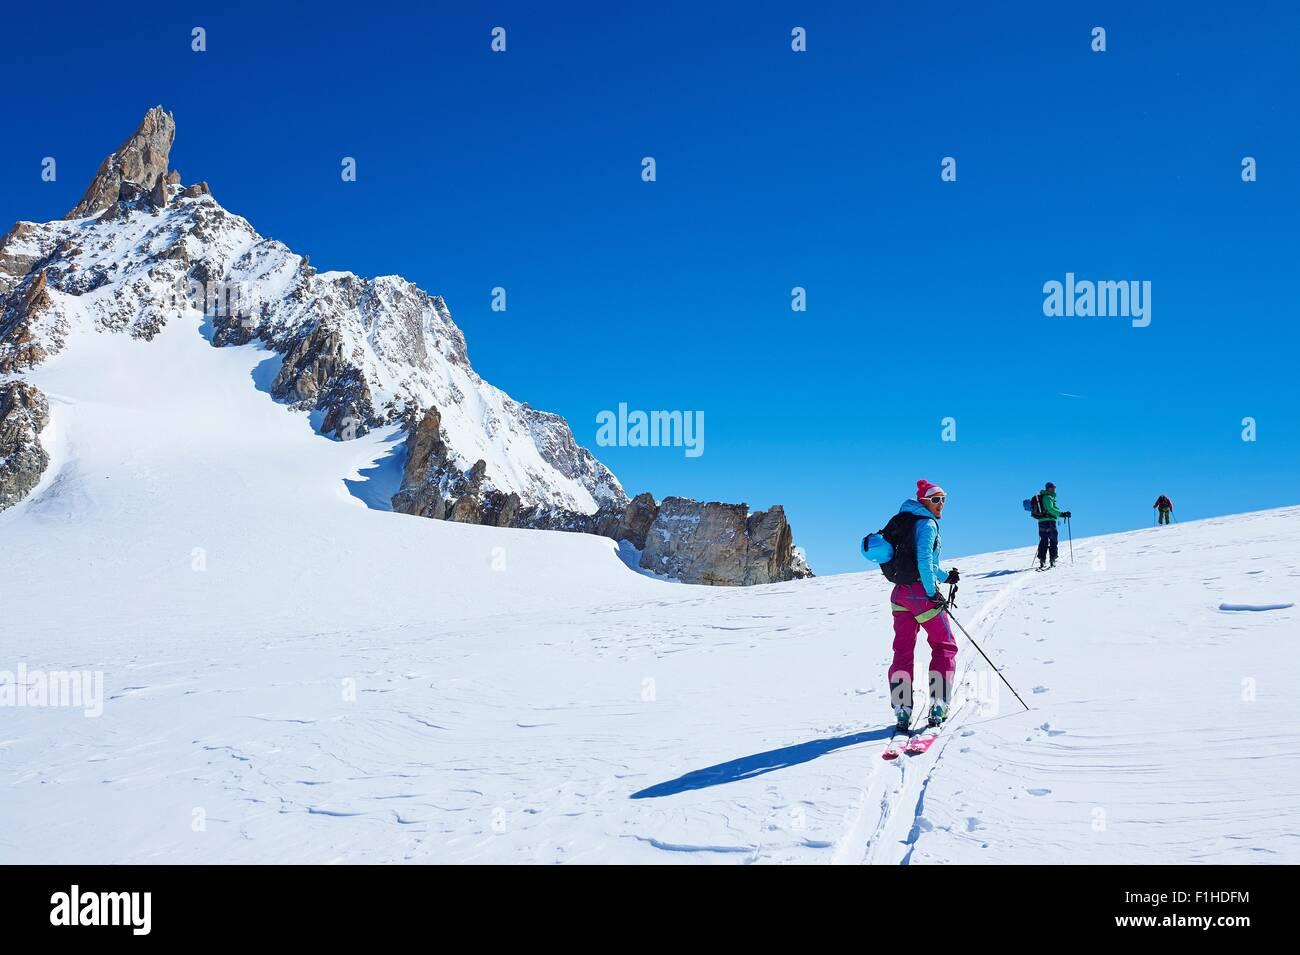 Tres adulto maduro esquiadores subiendo Graian macizo del Mont Blanc, Alpes, Francia Imagen De Stock